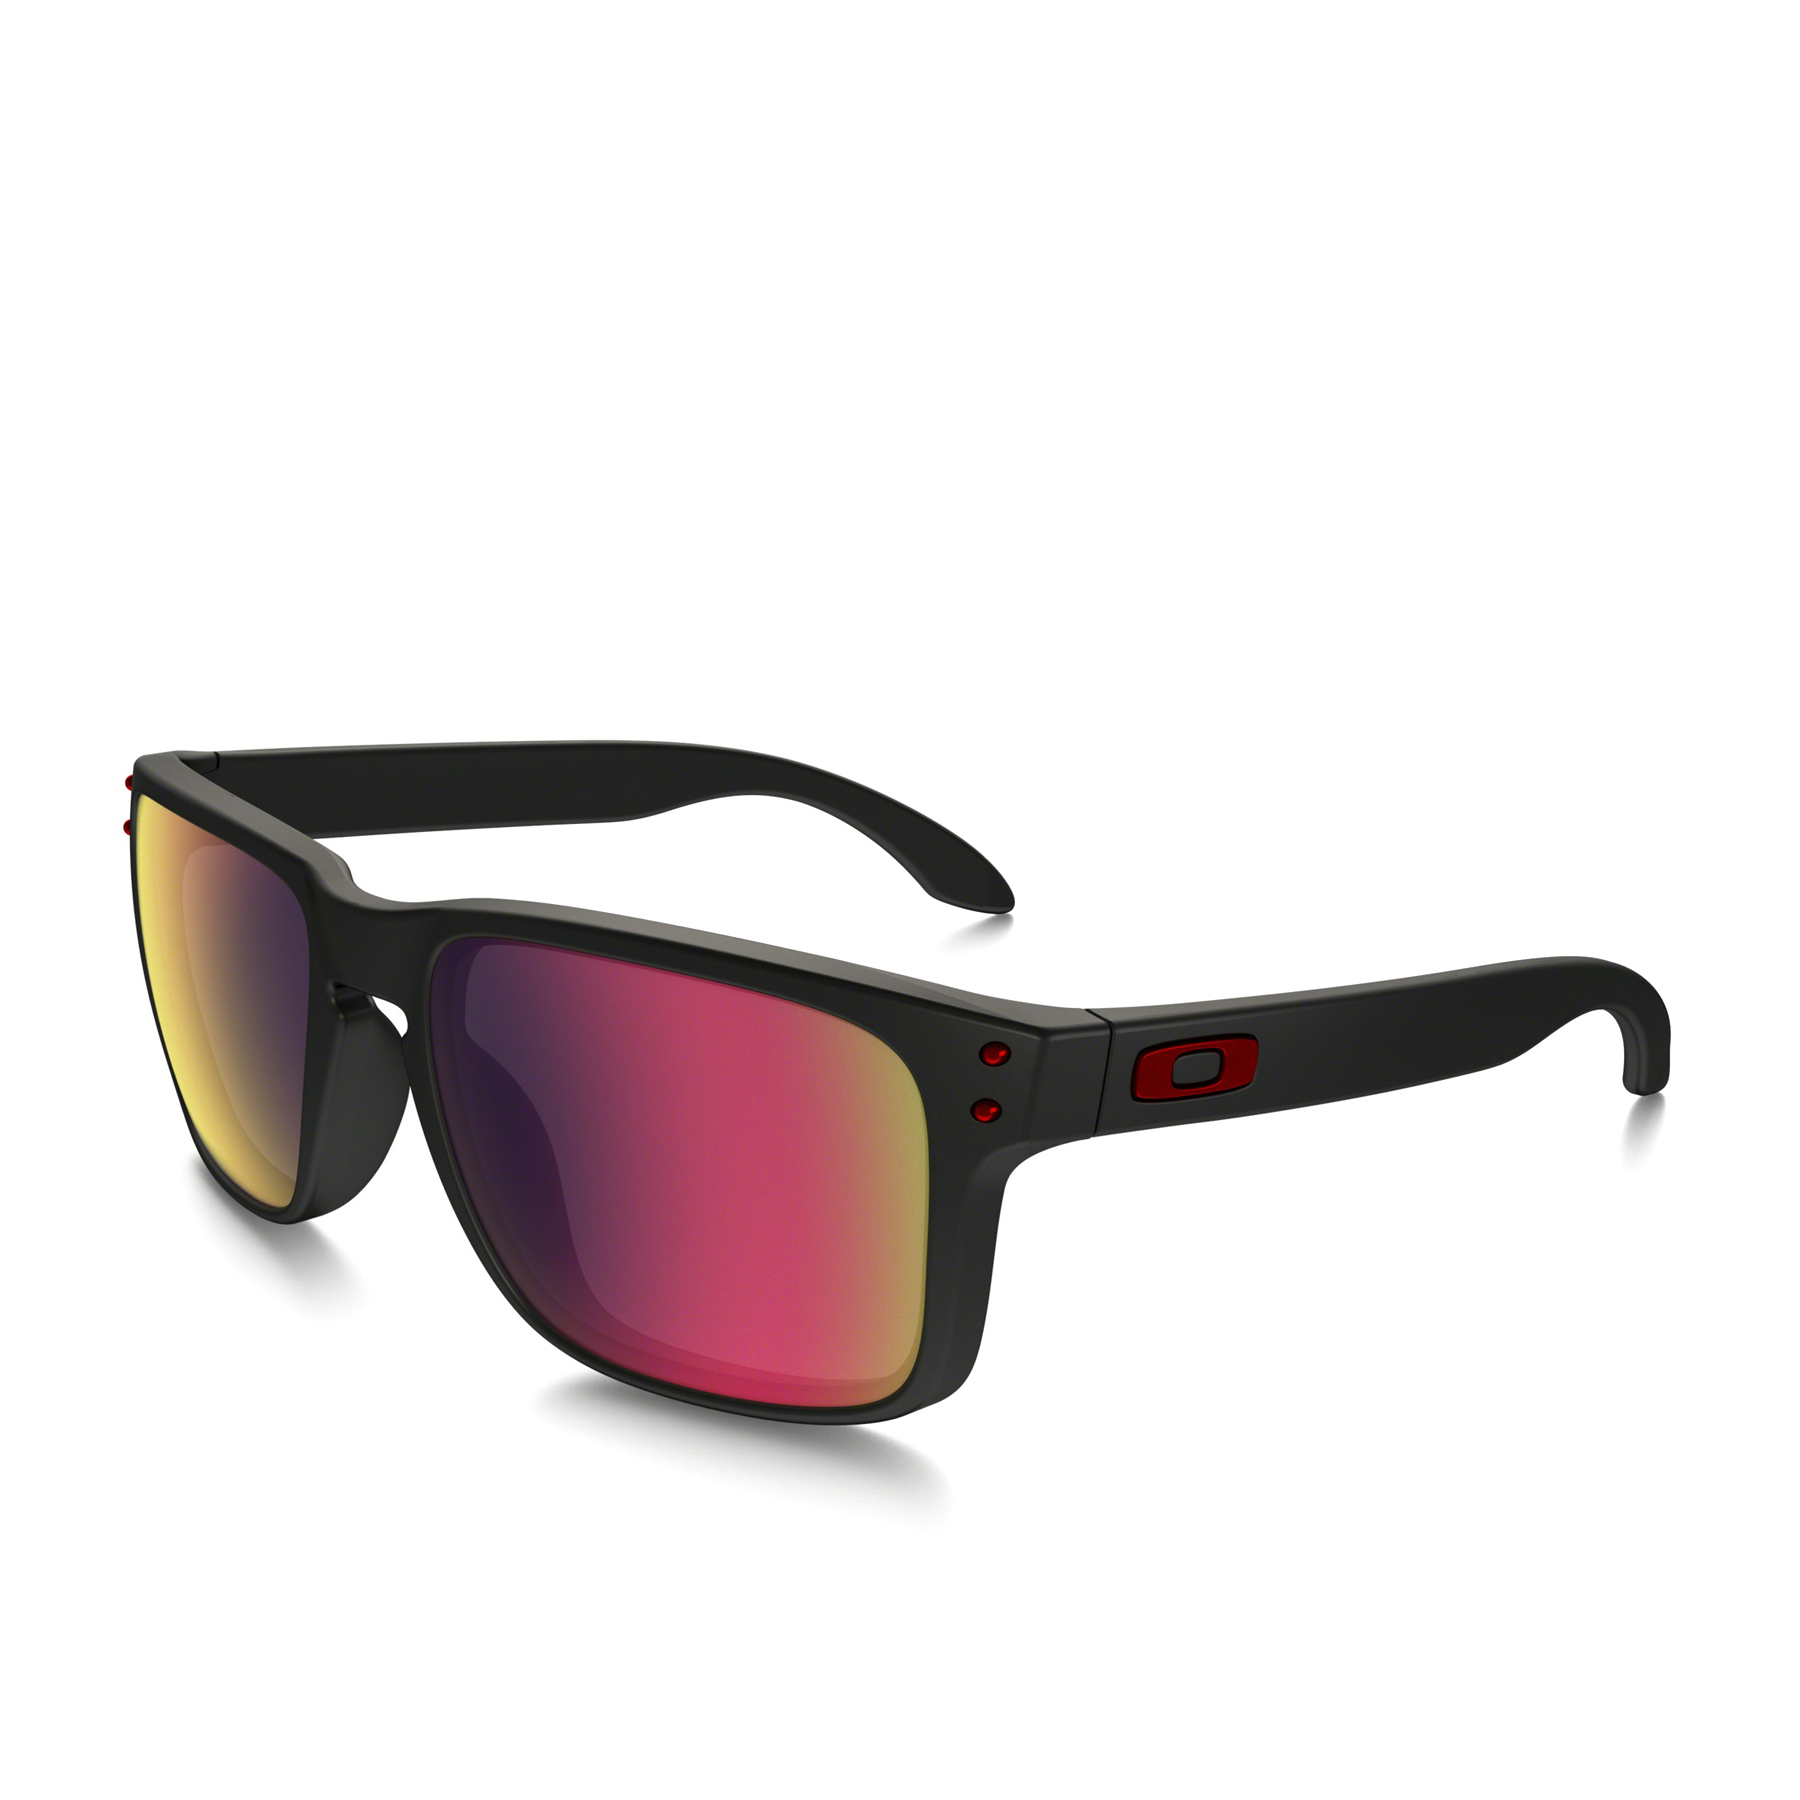 Oakley Holbrook Mens Sunglasses - Matte Black ~ Positive Red Iridium